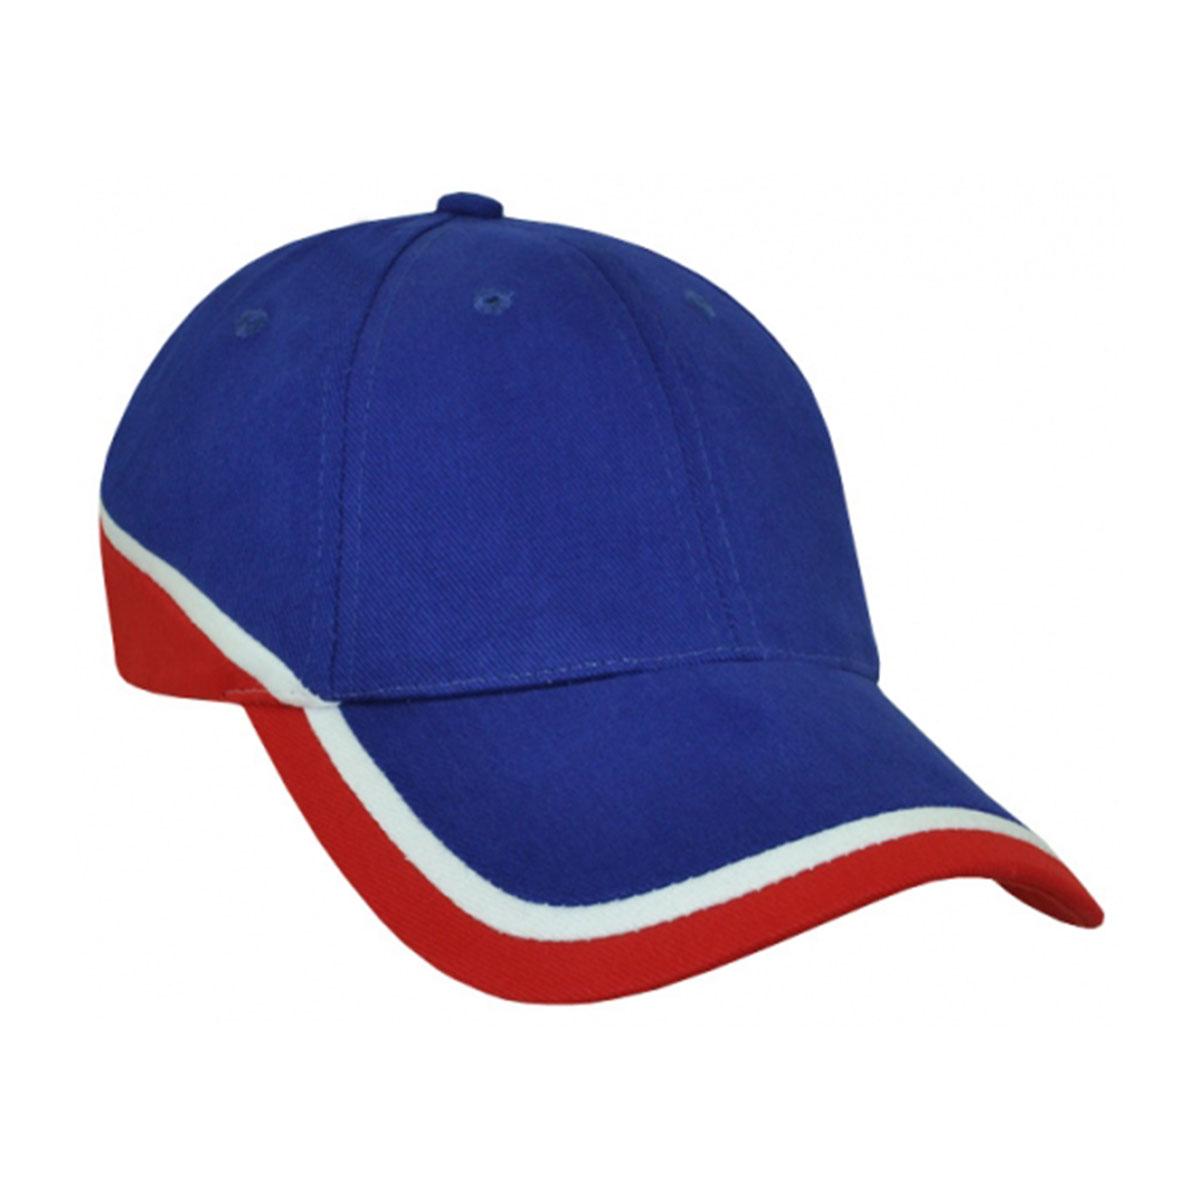 Mountain Cap-Royal / White / Red